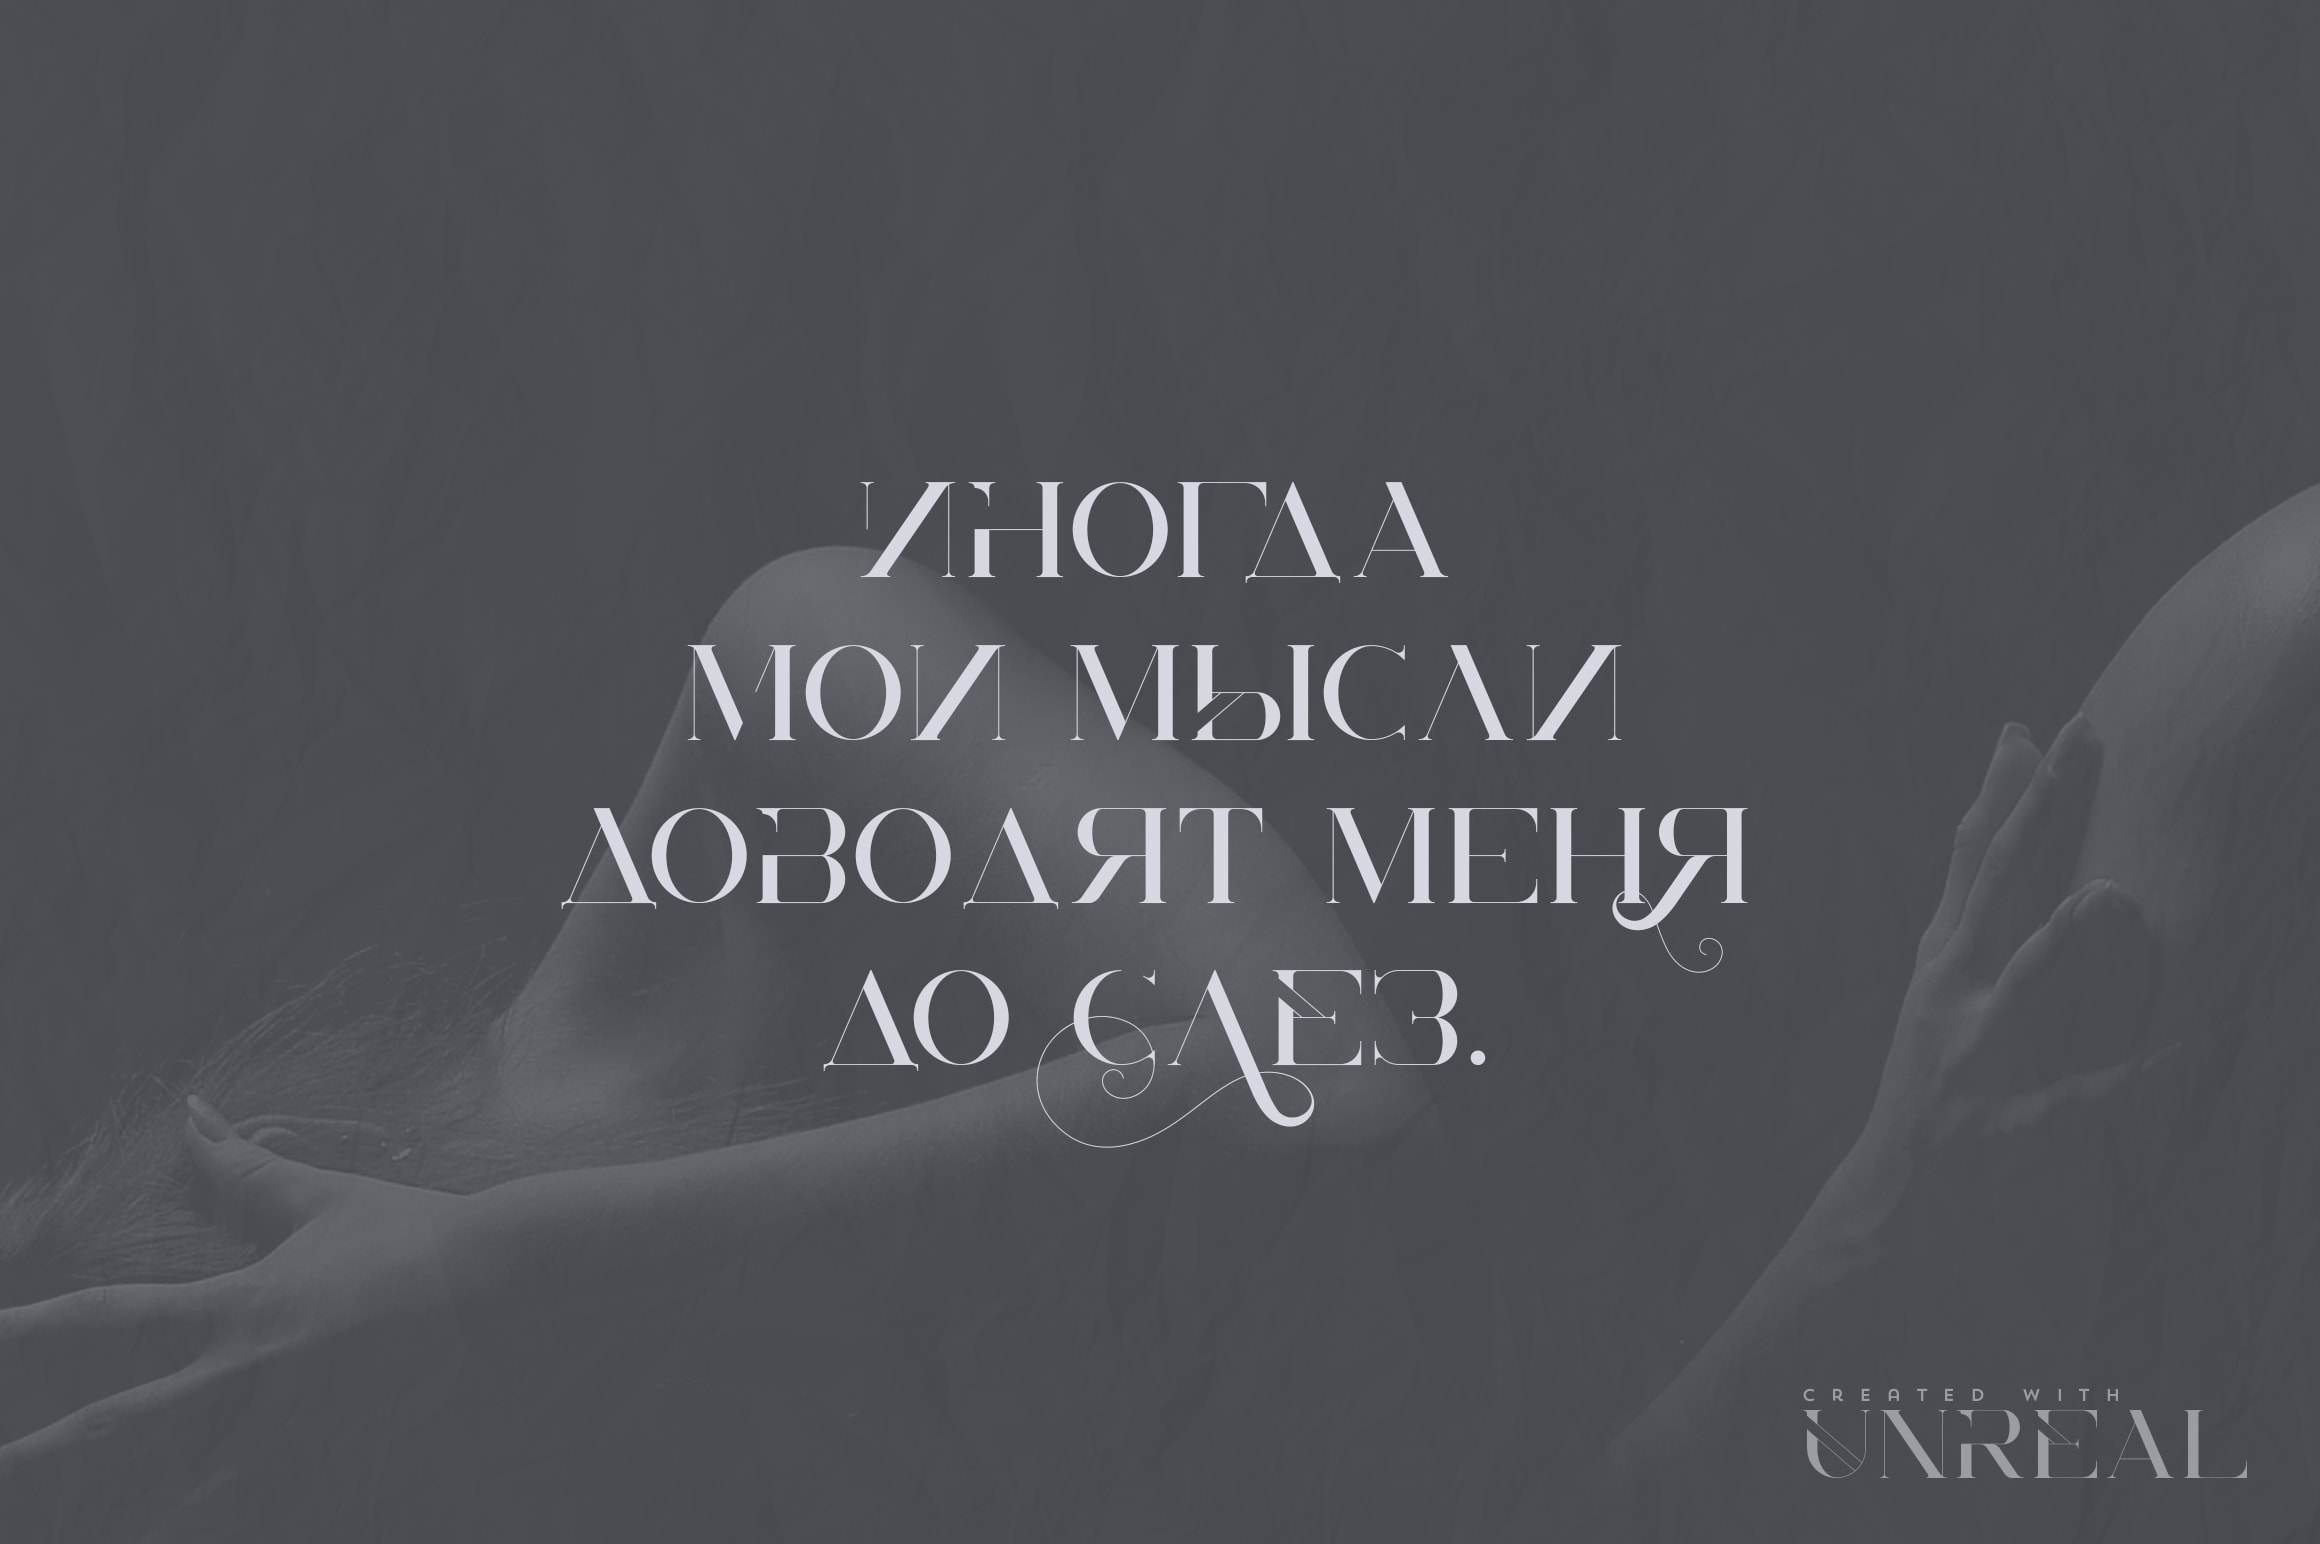 Unreal Serif Font: Latin & Cyrillic - 6 min